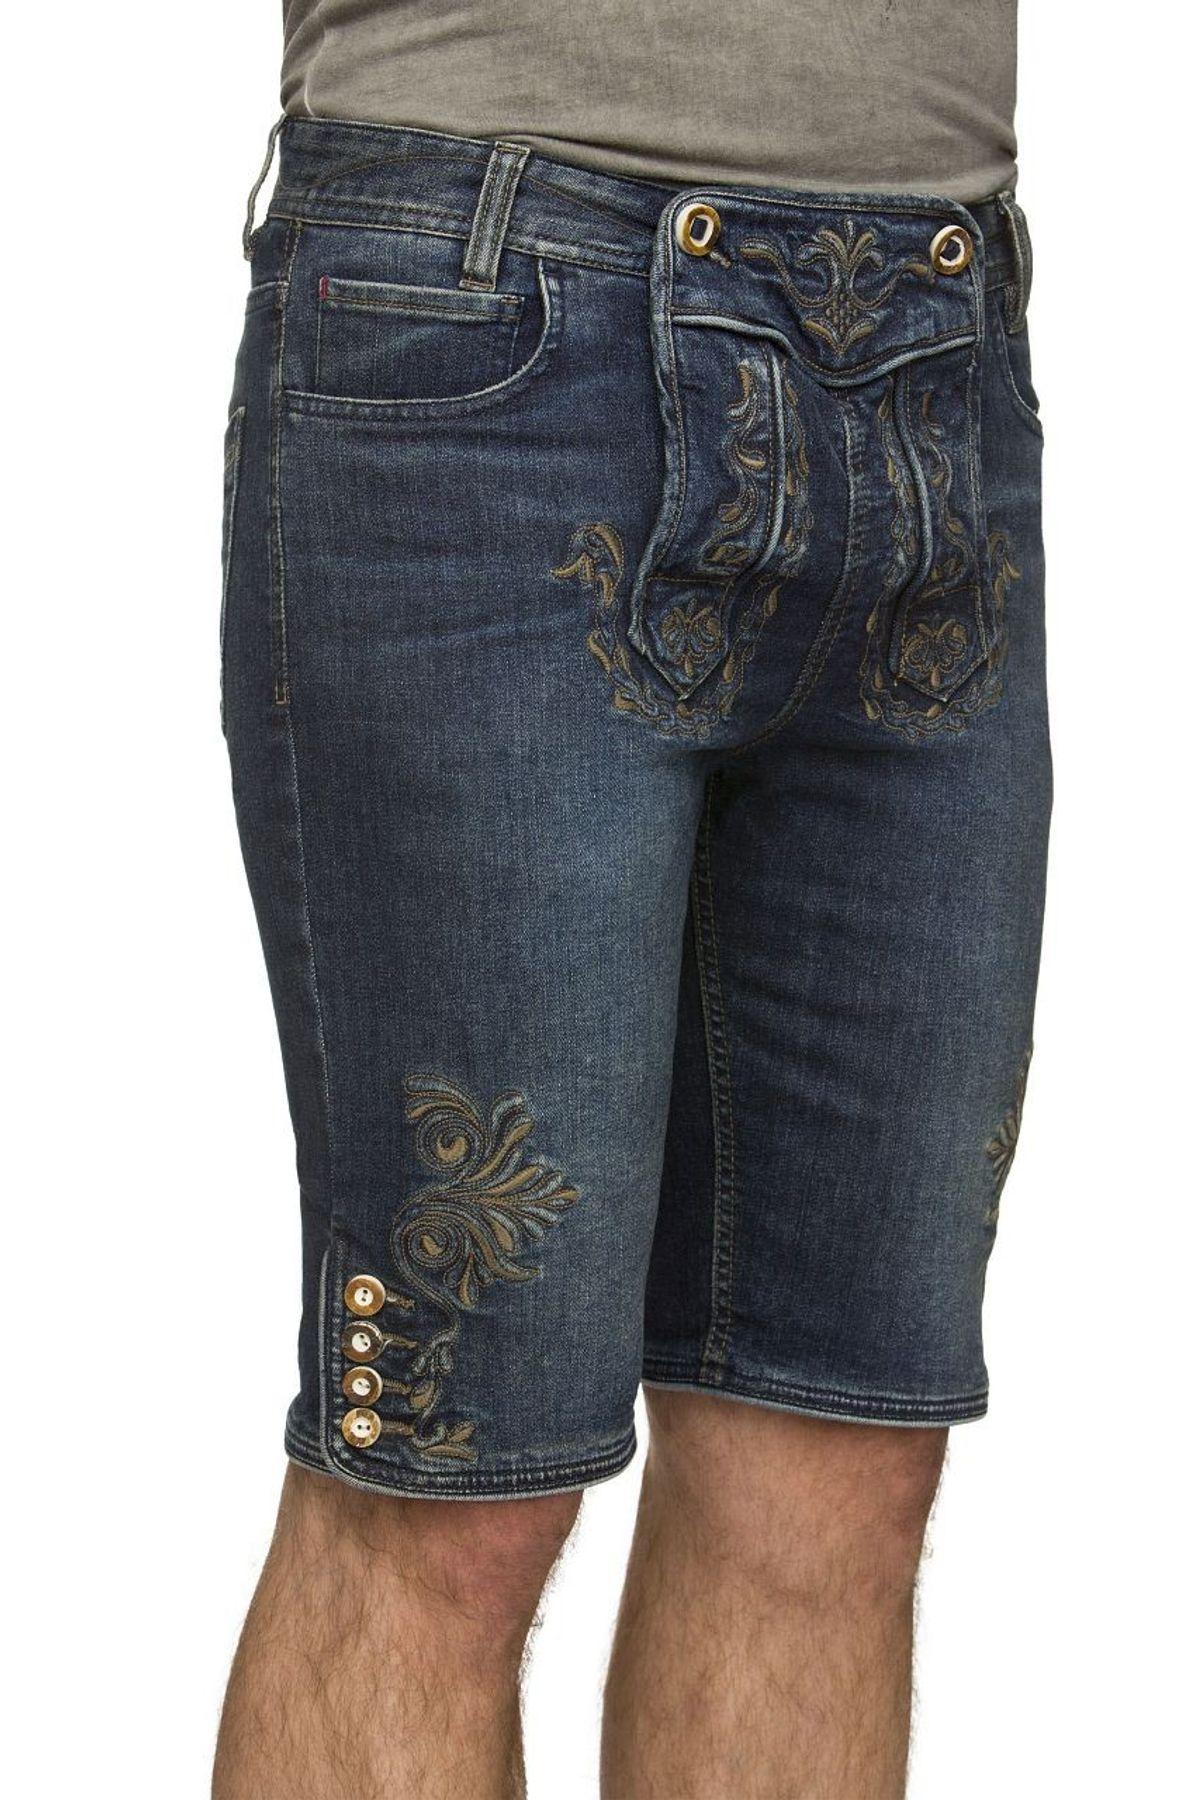 Stockerpoint - Herren Trachtenshort Jeans, Mick – Bild 4